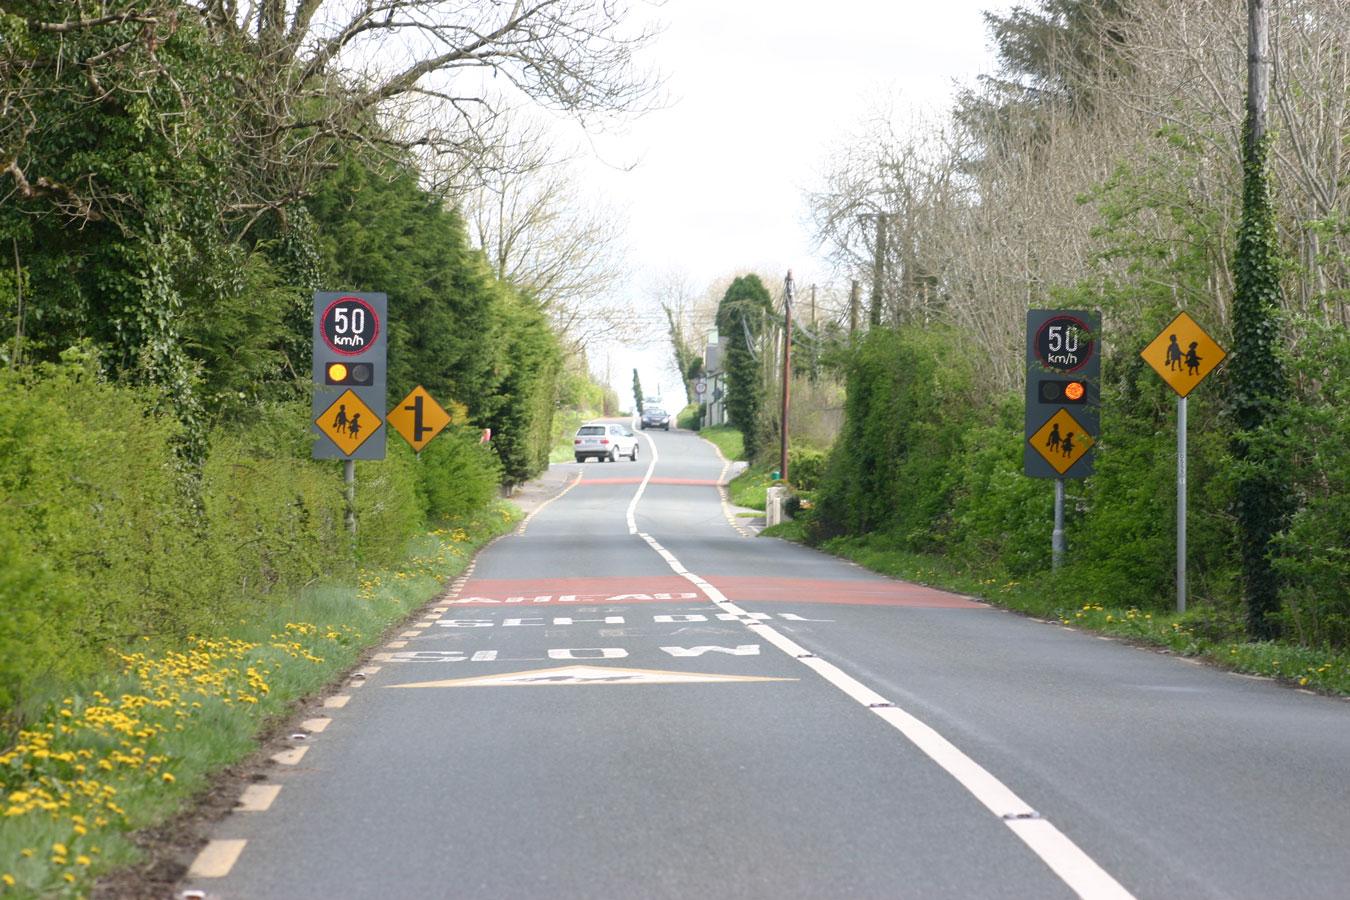 Belisha beacons on approach to school